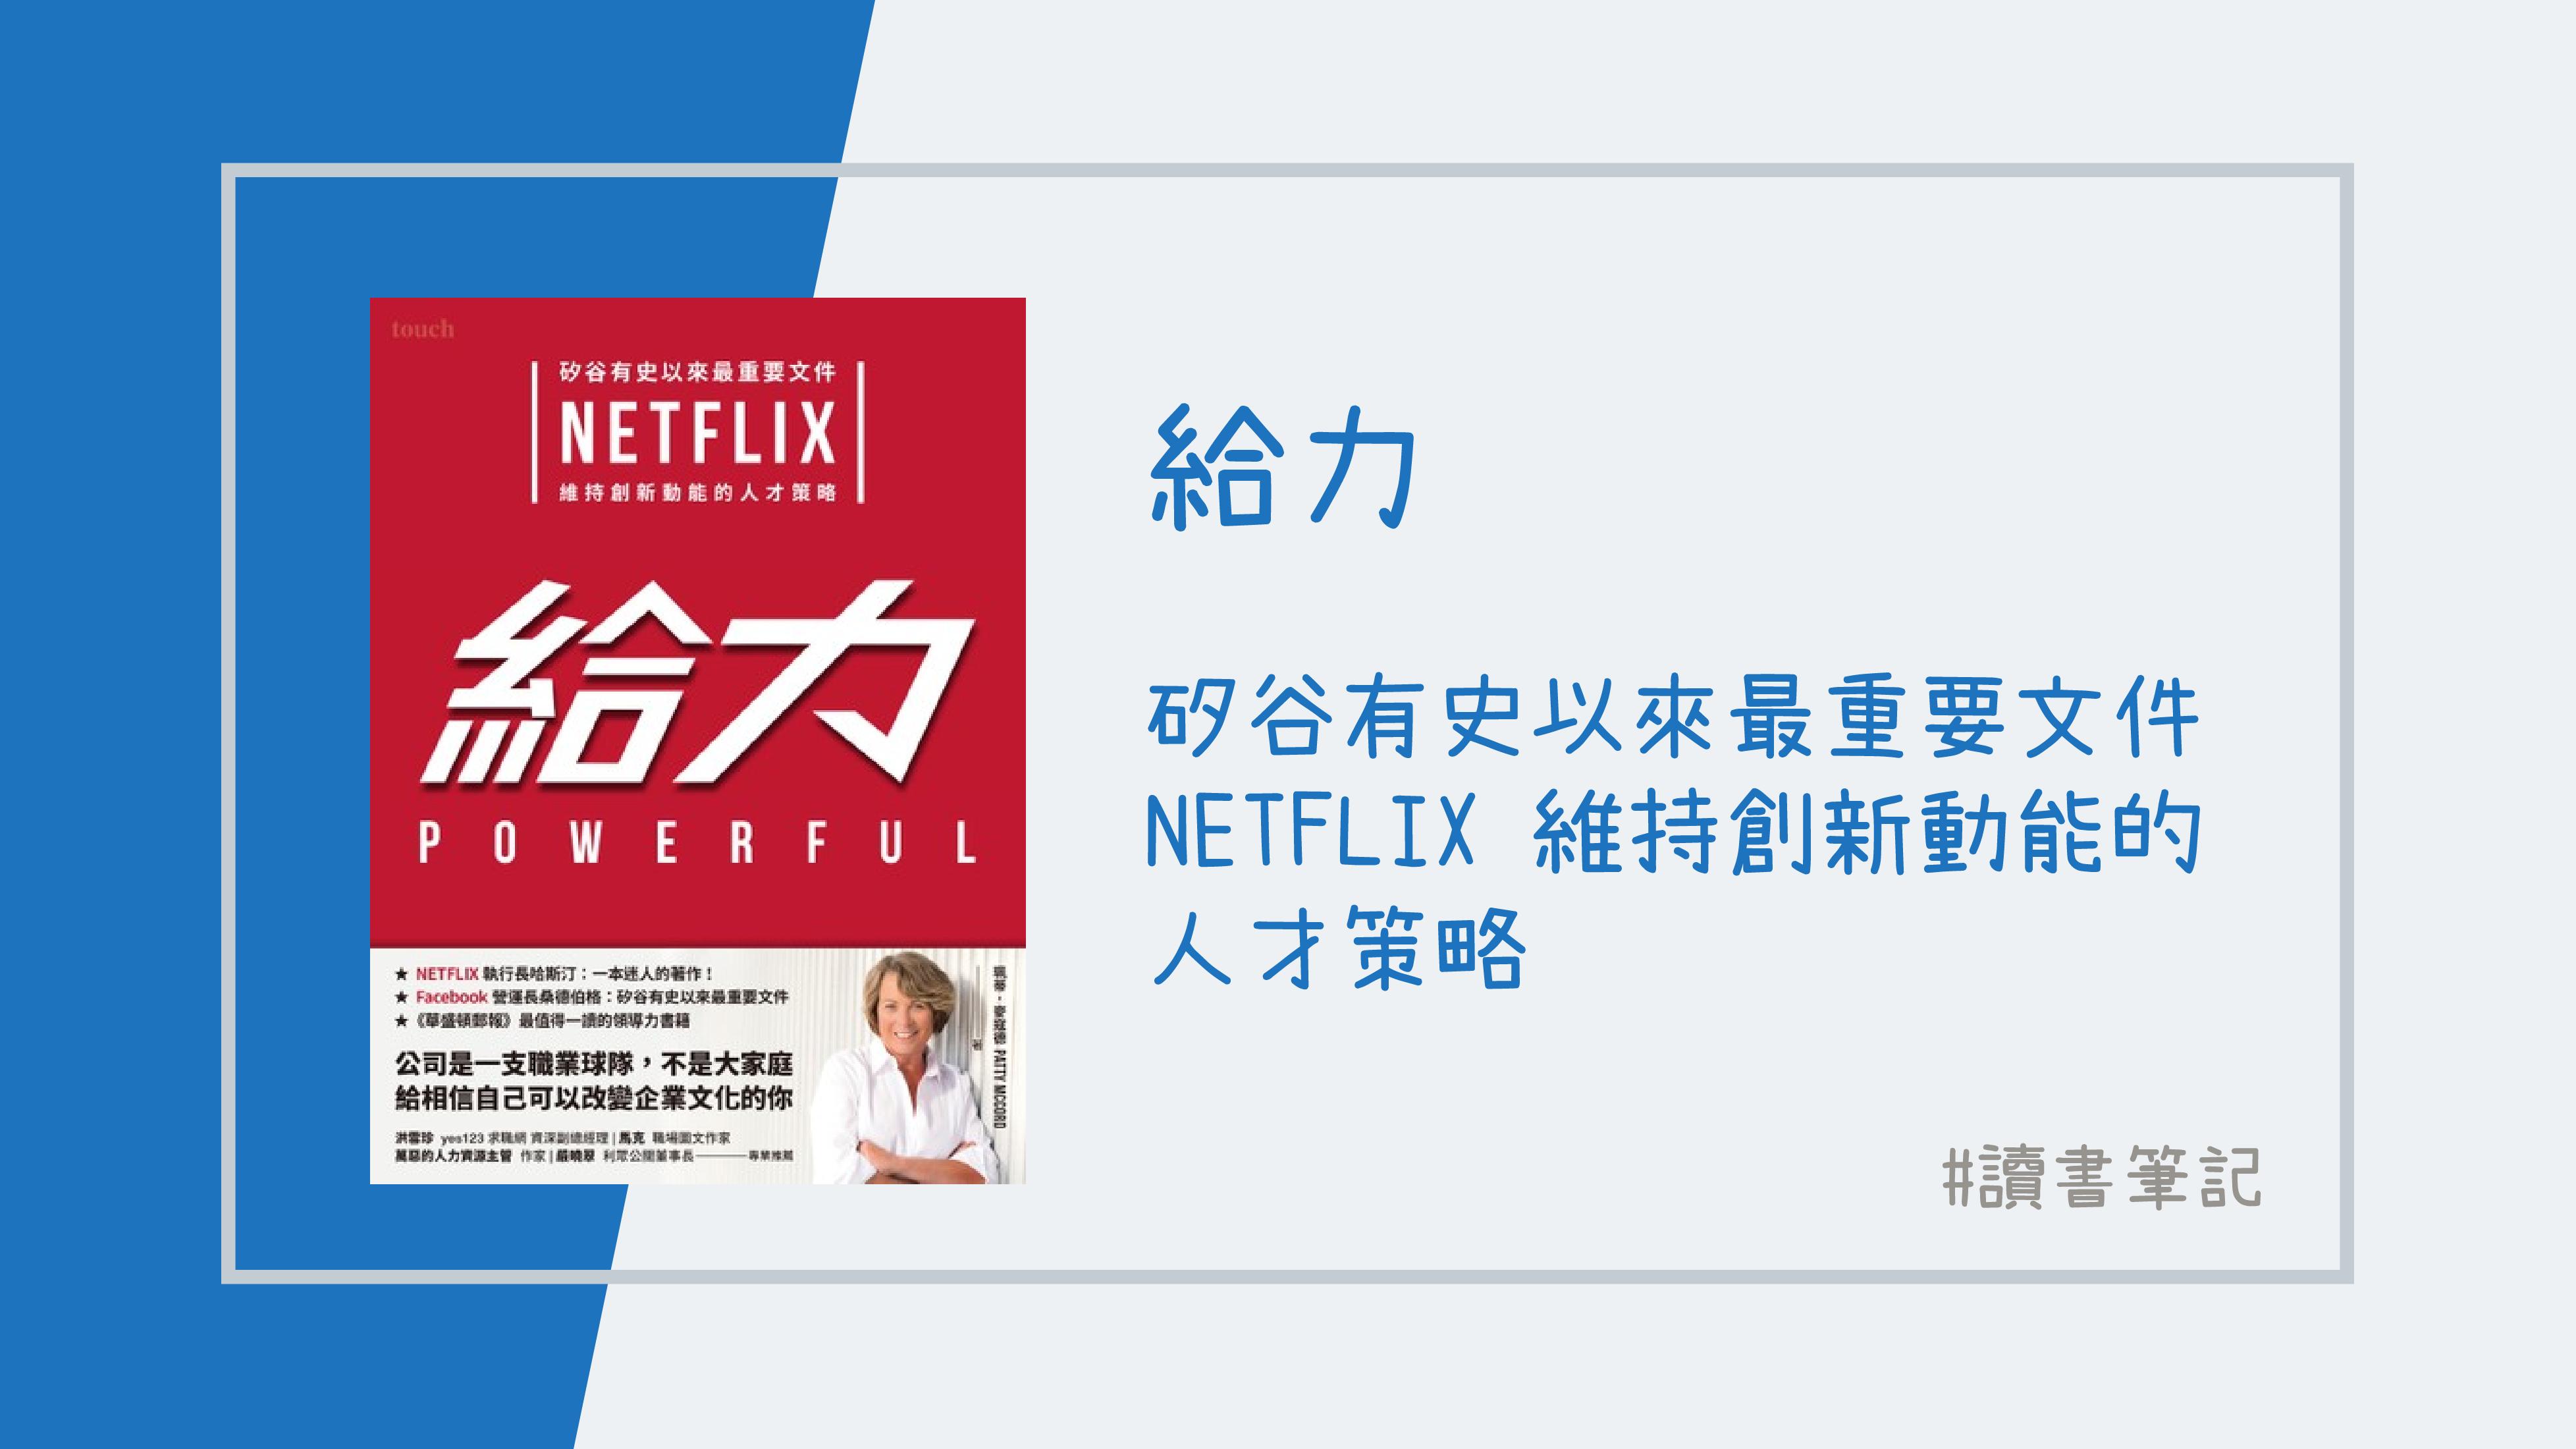 netflix power - 《給力》閱讀筆記,自由與責任的企業文化